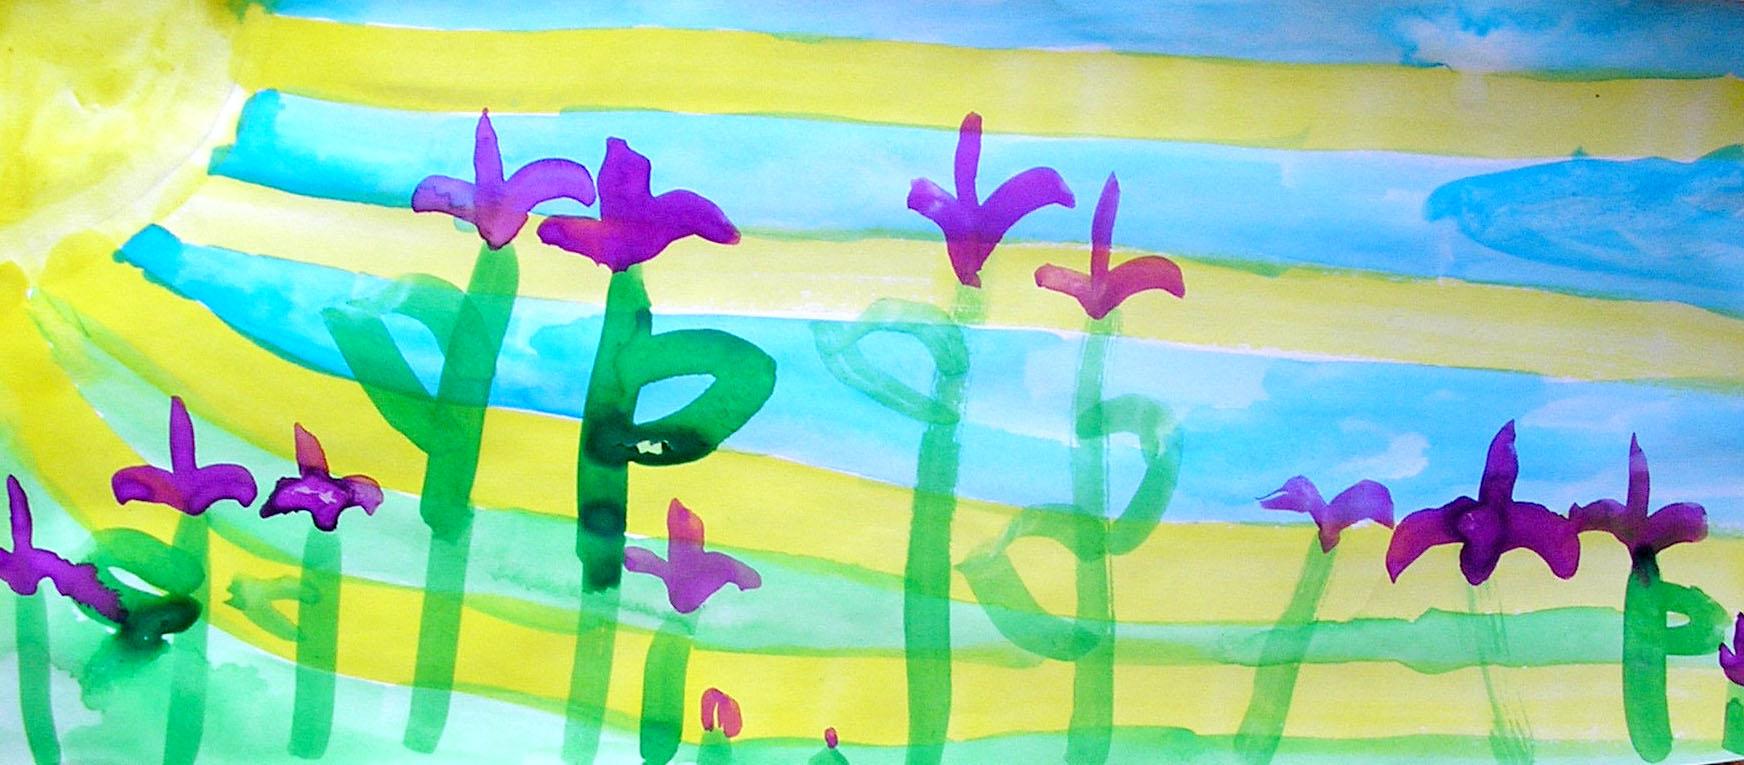 Stefania, age 5. Watercolors.